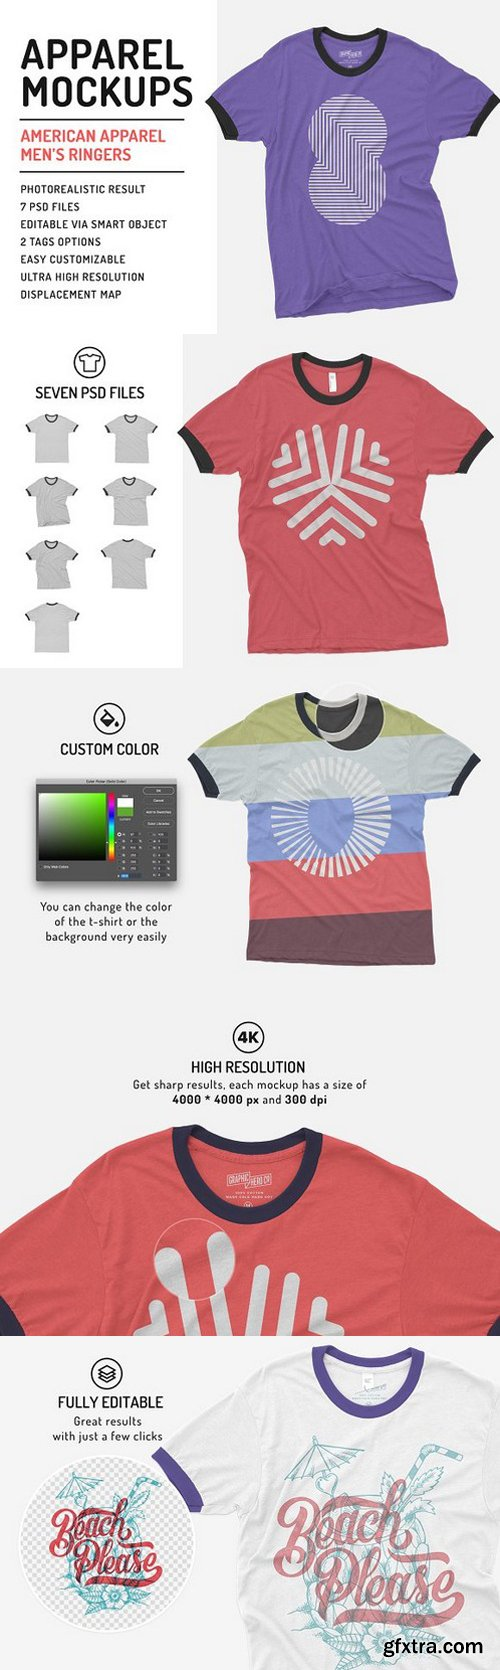 Download Cm Men S Ringers T Shirt Mockup 1518249 Clothing Mockup Shirt Mockup Tshirt Mockup